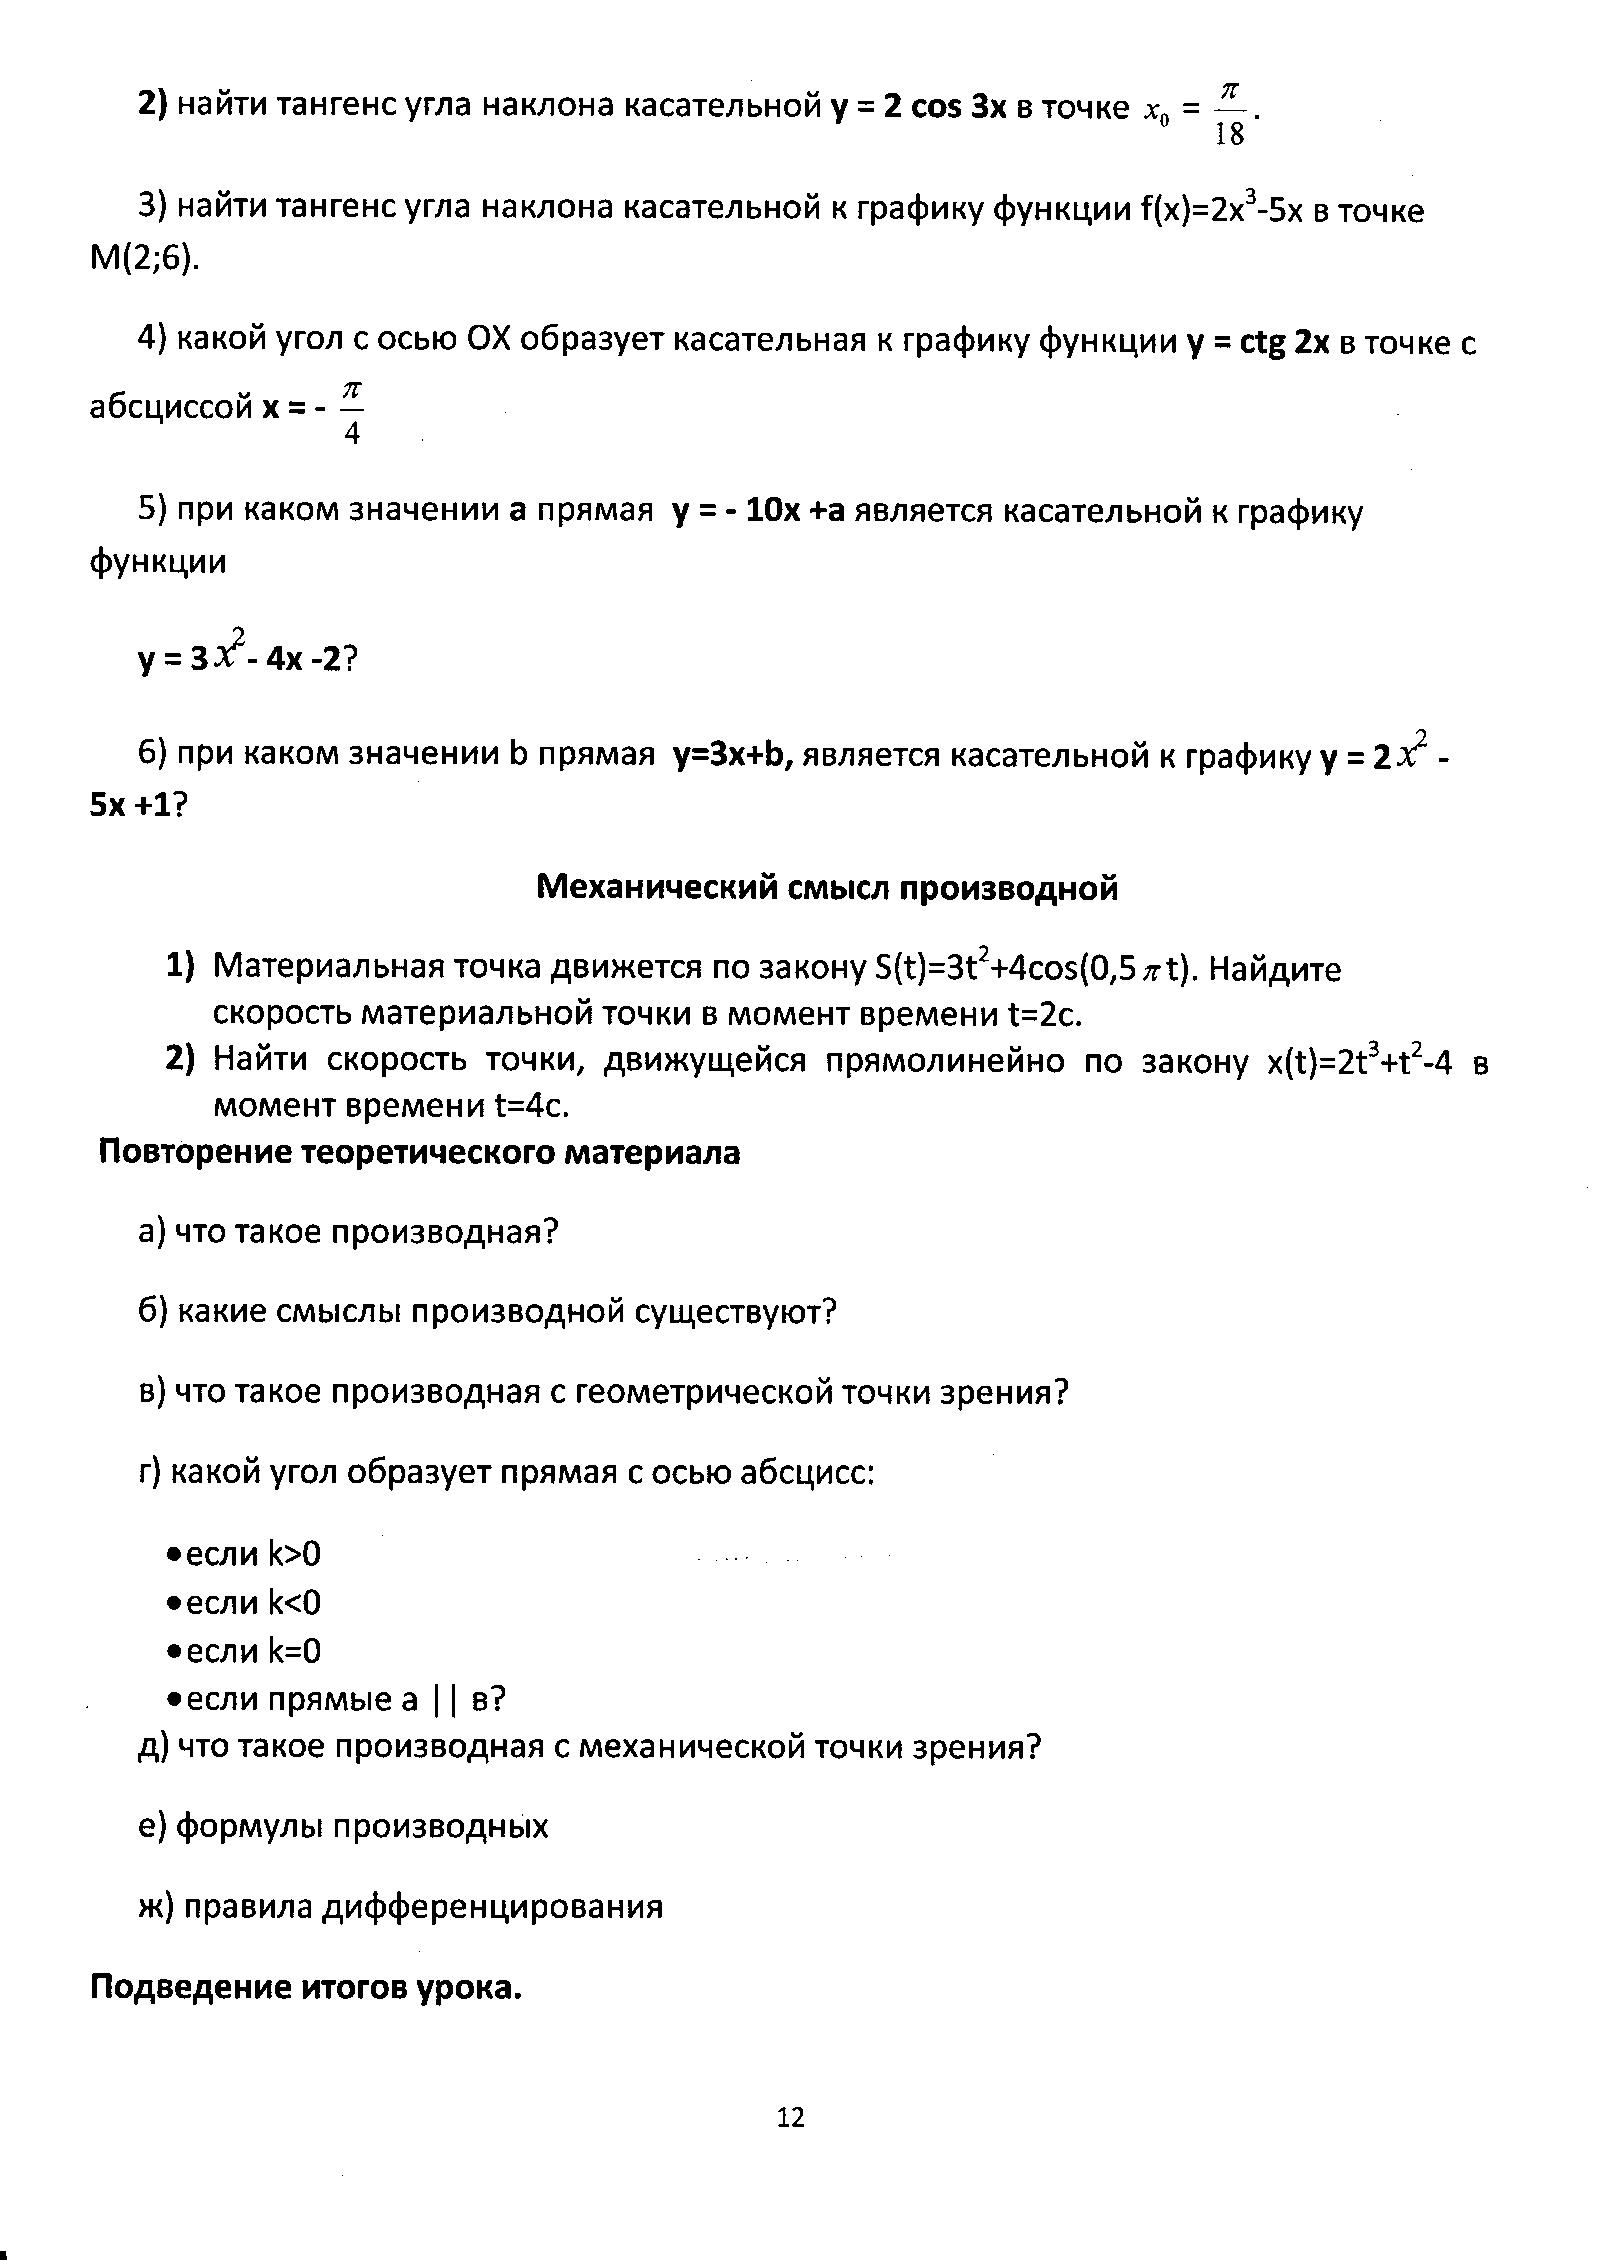 C:\Documents and Settings\Юлия\Мои документы\Мои рисунки\MP Navigator EX\2012_02_20\IMG_0012.tif